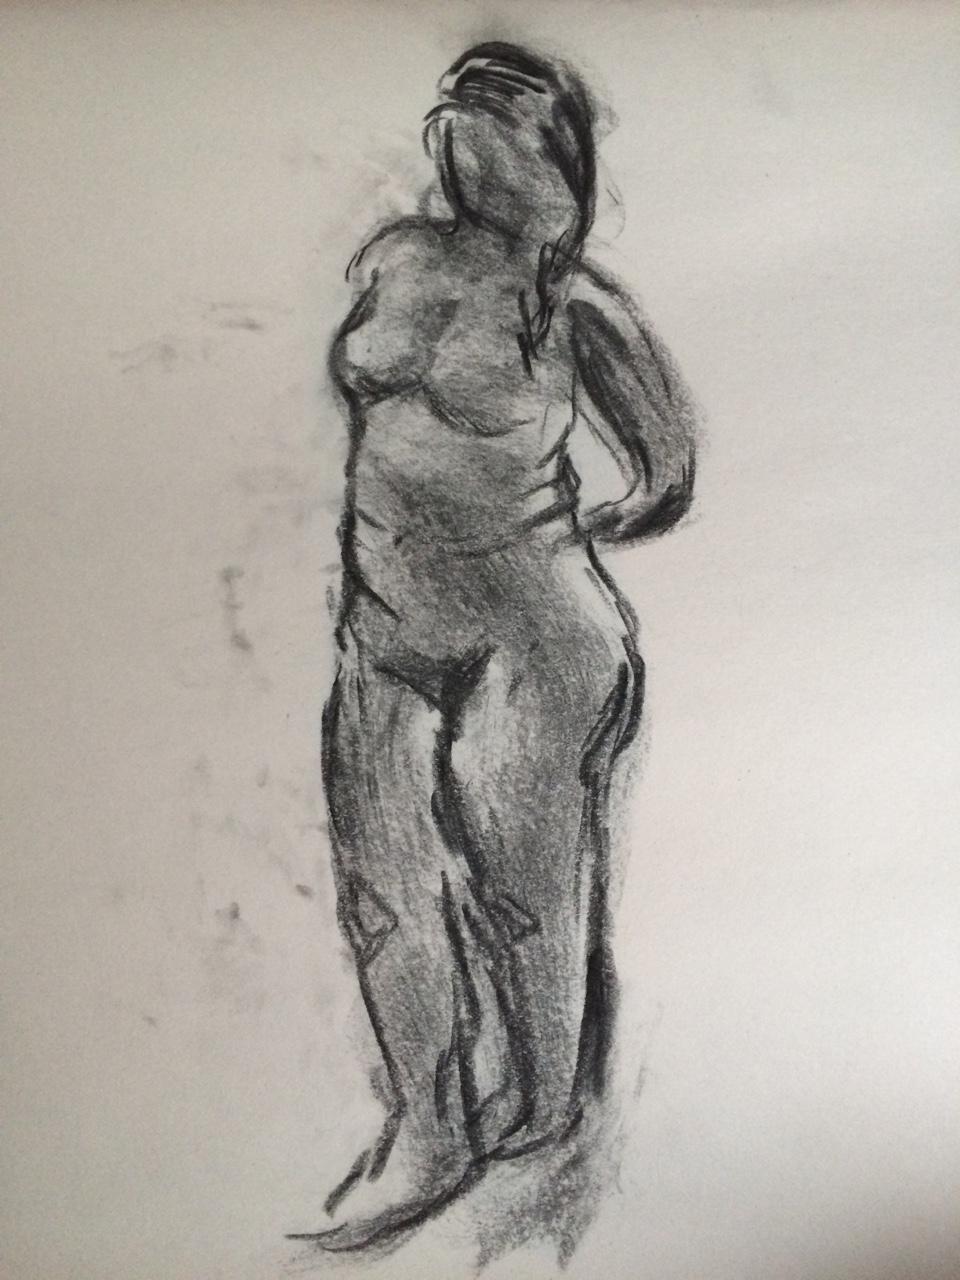 960x1280 Live Drawings Charcoal On Newsprint Artsy Behavior